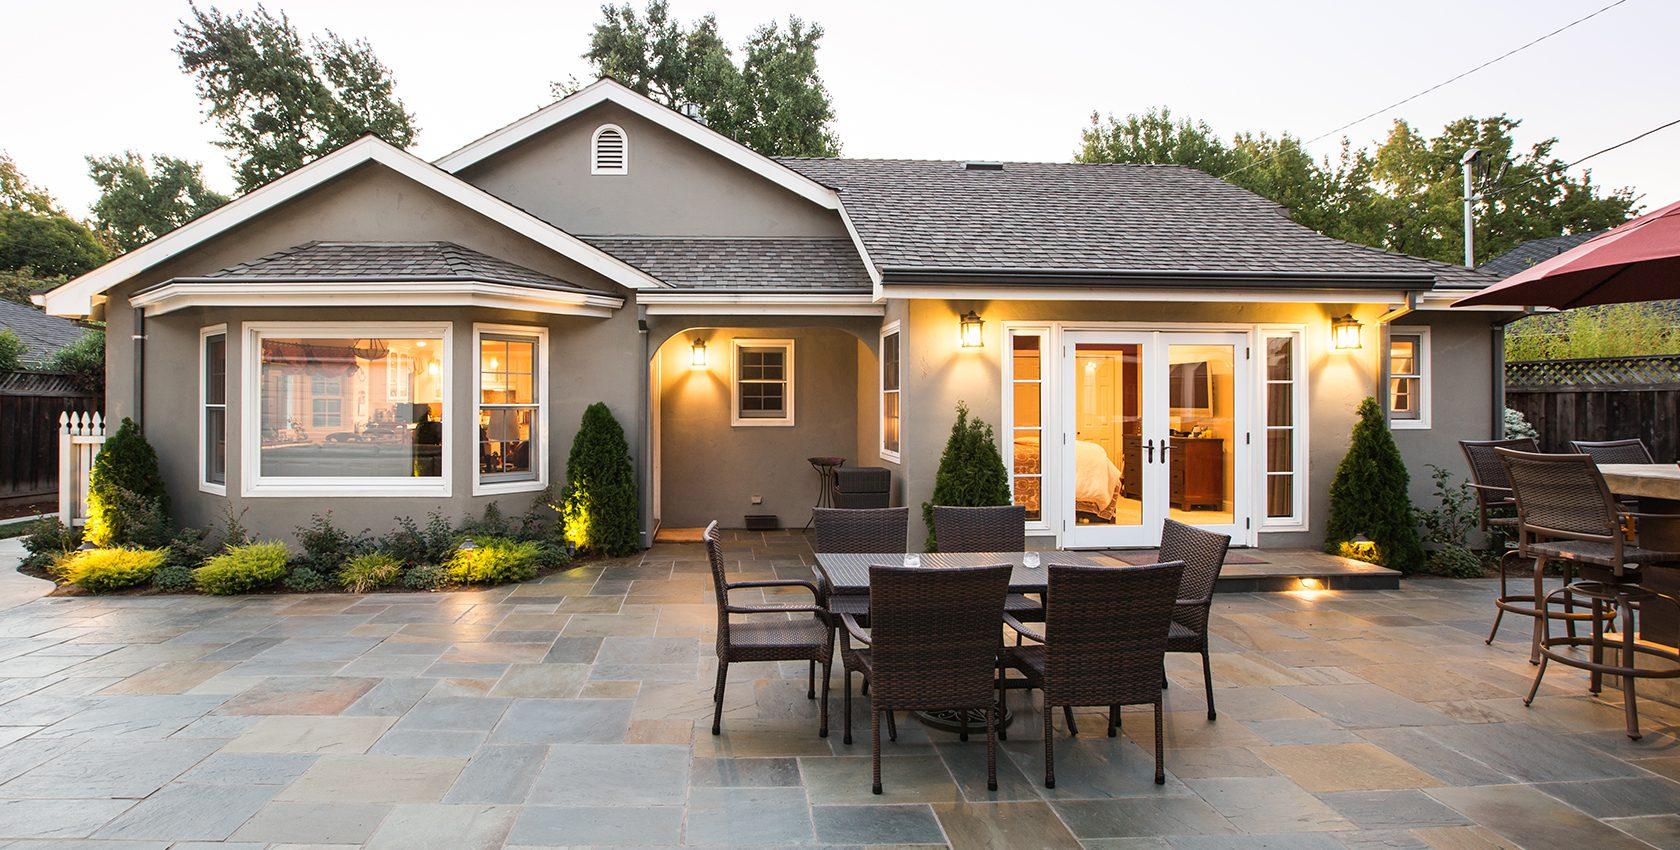 7 Exterior Renovation Ideas That Get Noticed